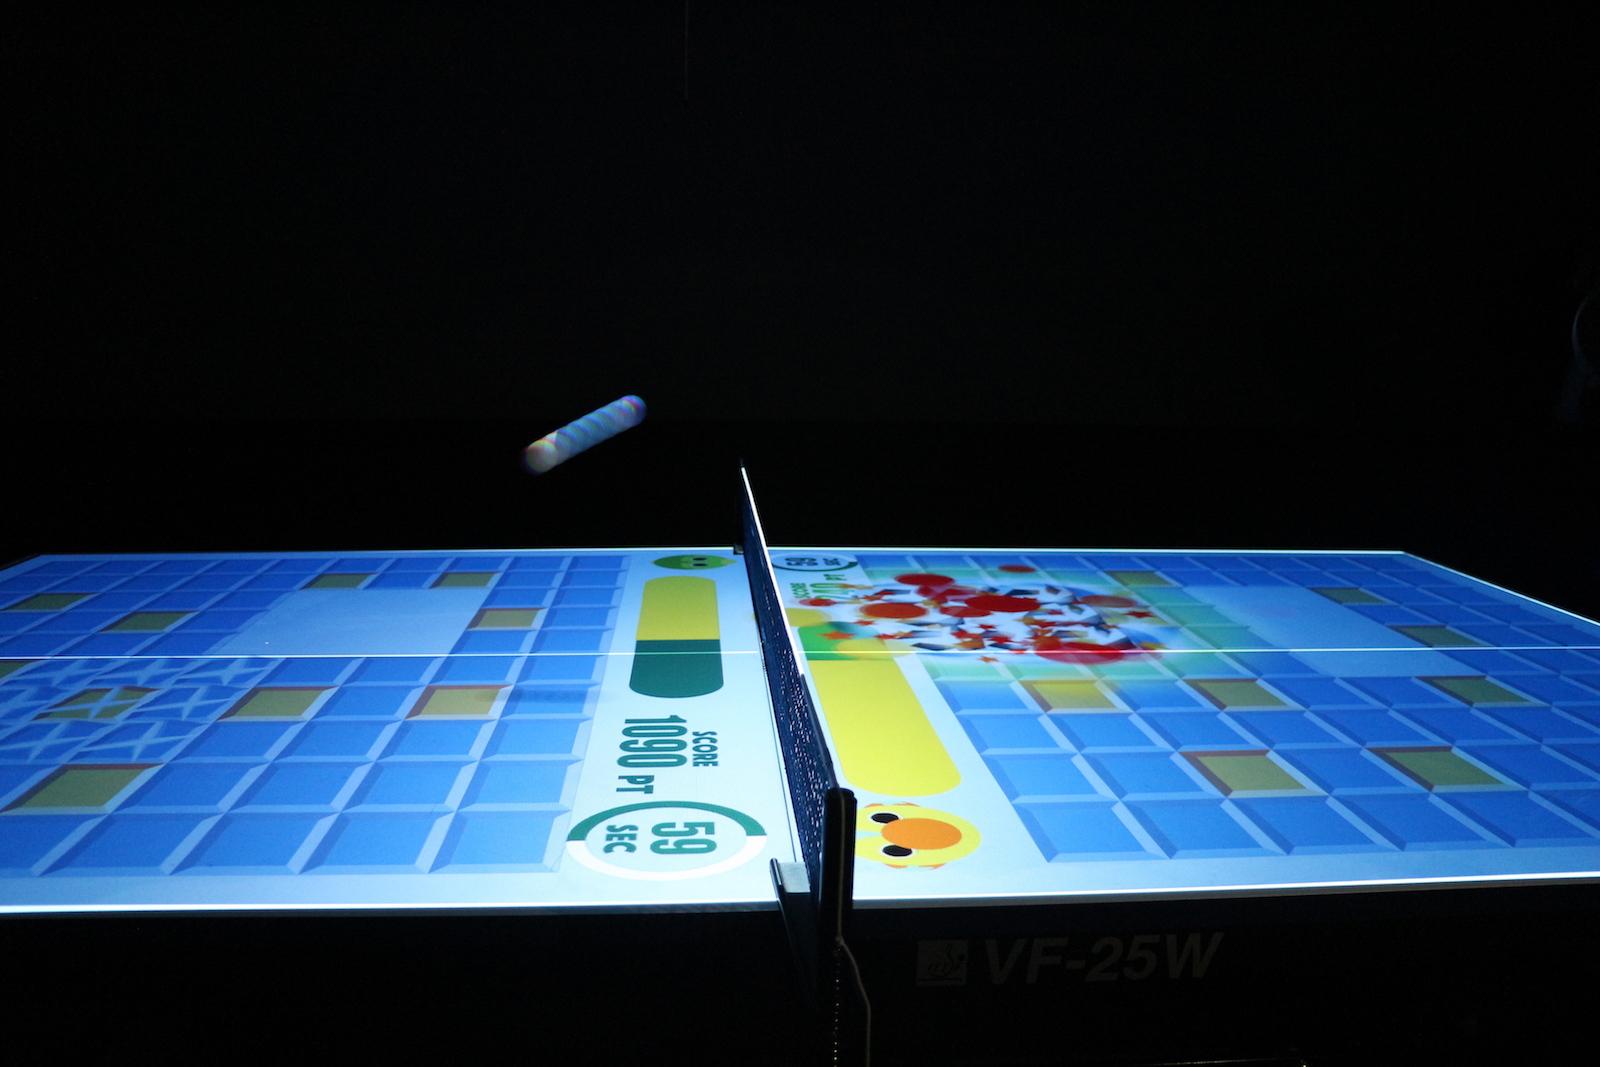 pingpong3.jpg